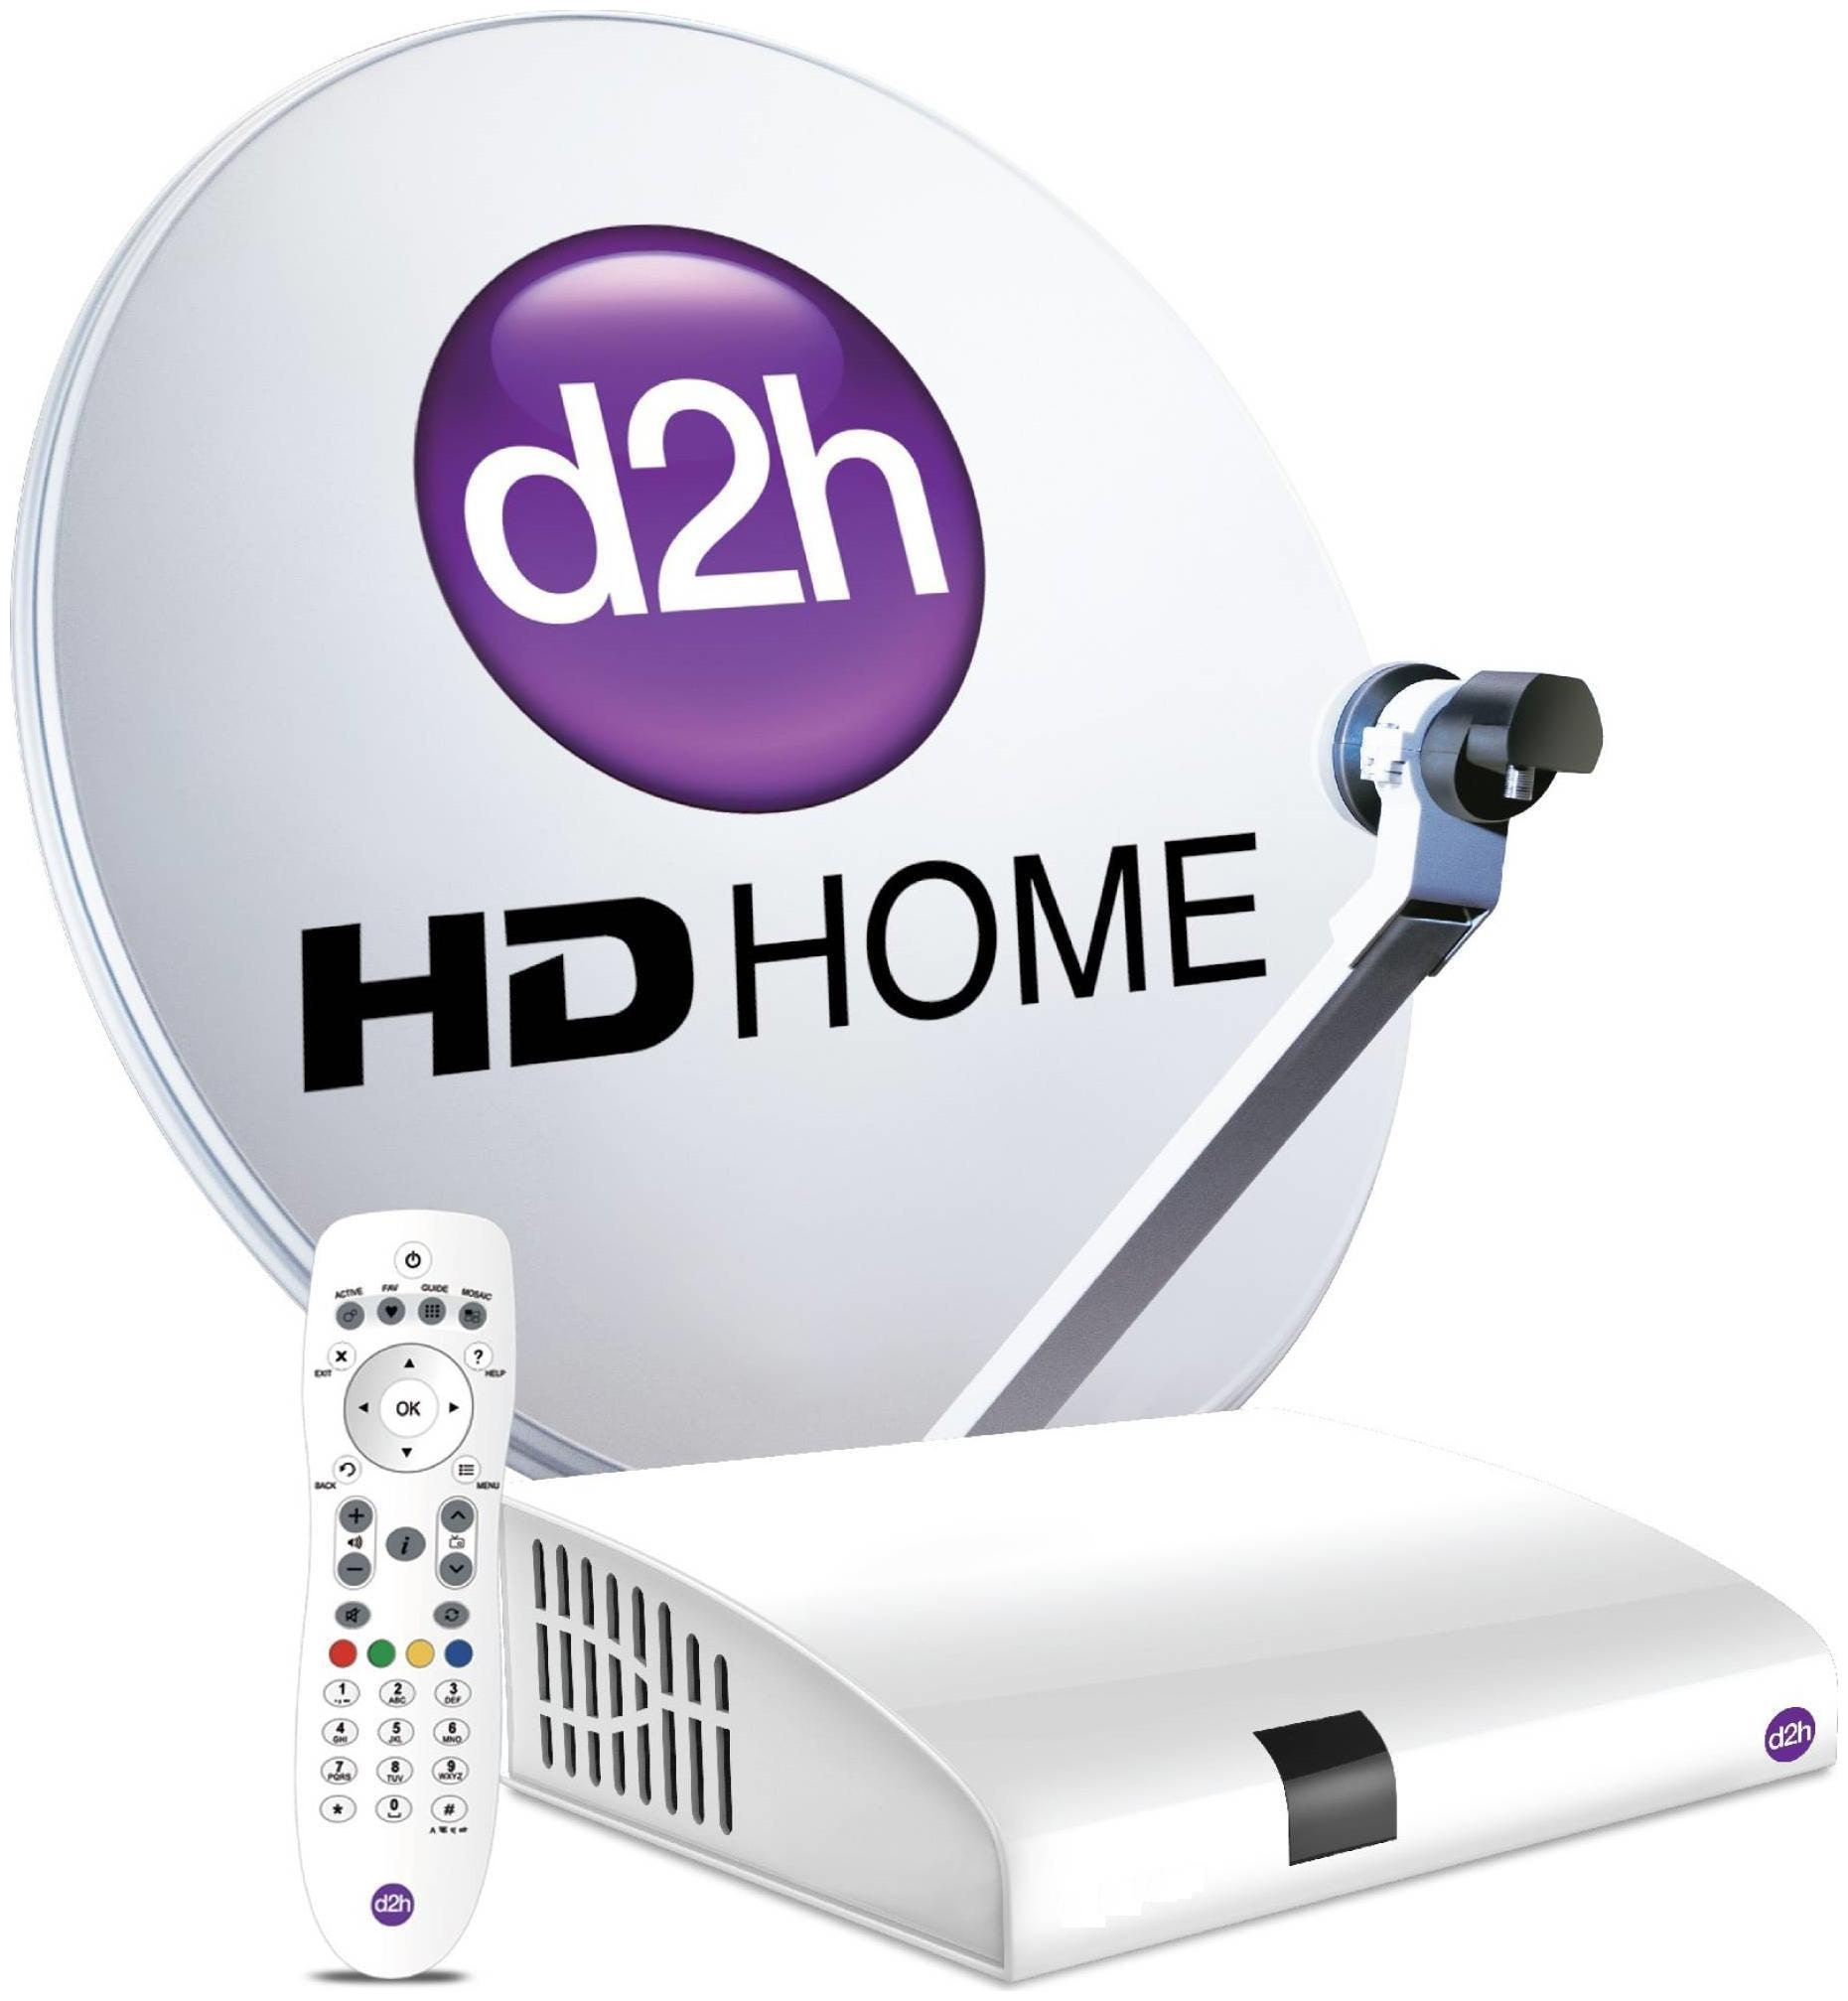 https://assetscdn1.paytm.com/images/catalog/product/M/ME/MEDD2H-HD-BOX-RDISH138213B436864F/1603052275046_4.jpg